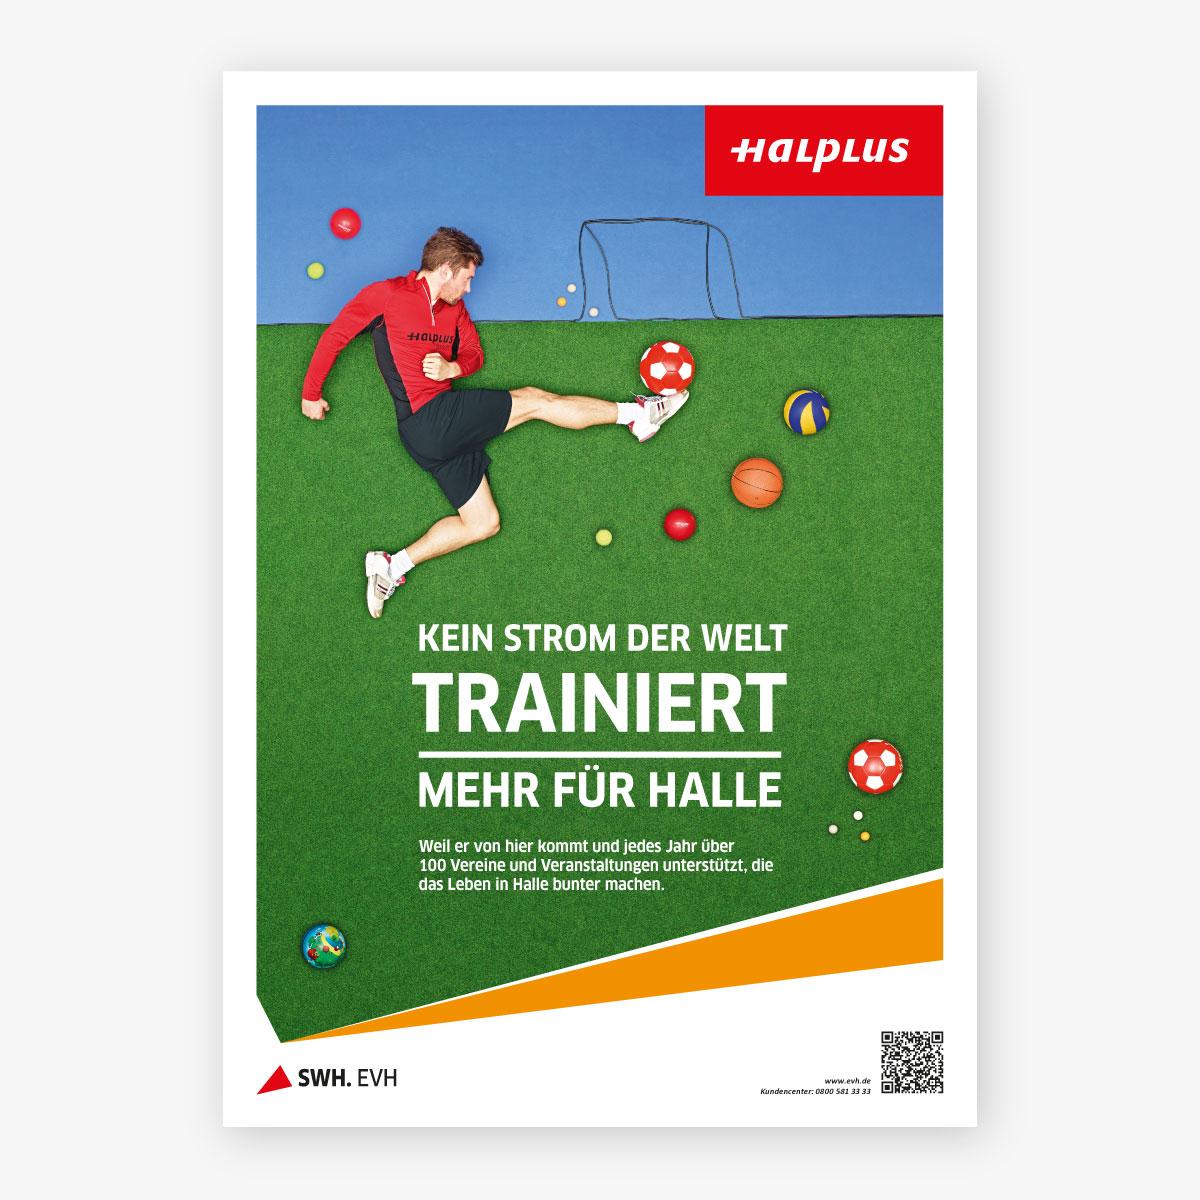 Plakat EVH Frühjahrskampagne 2013 Plakat Sport